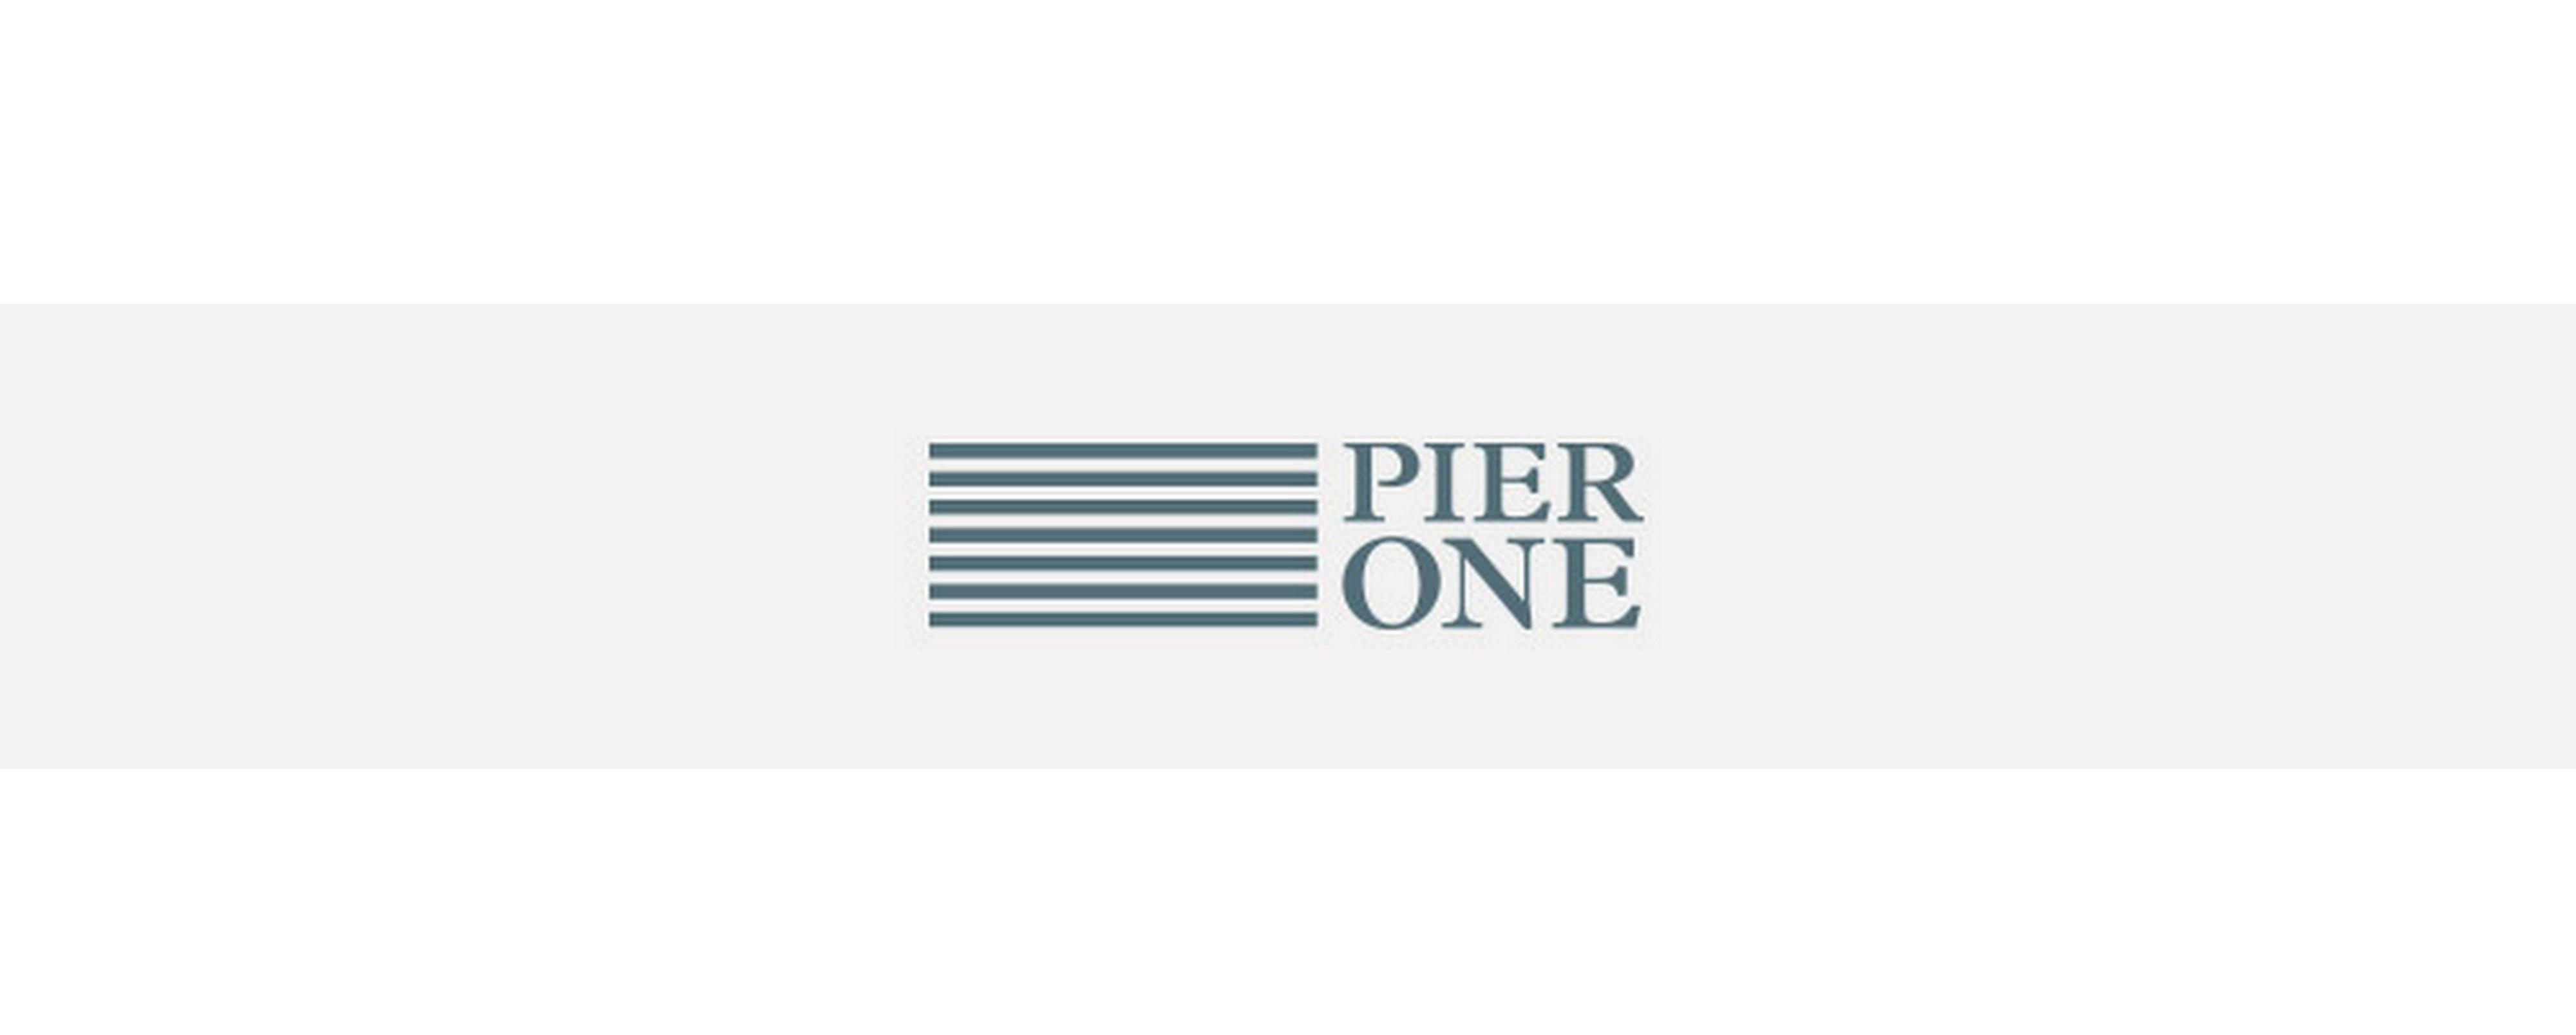 pier one logo